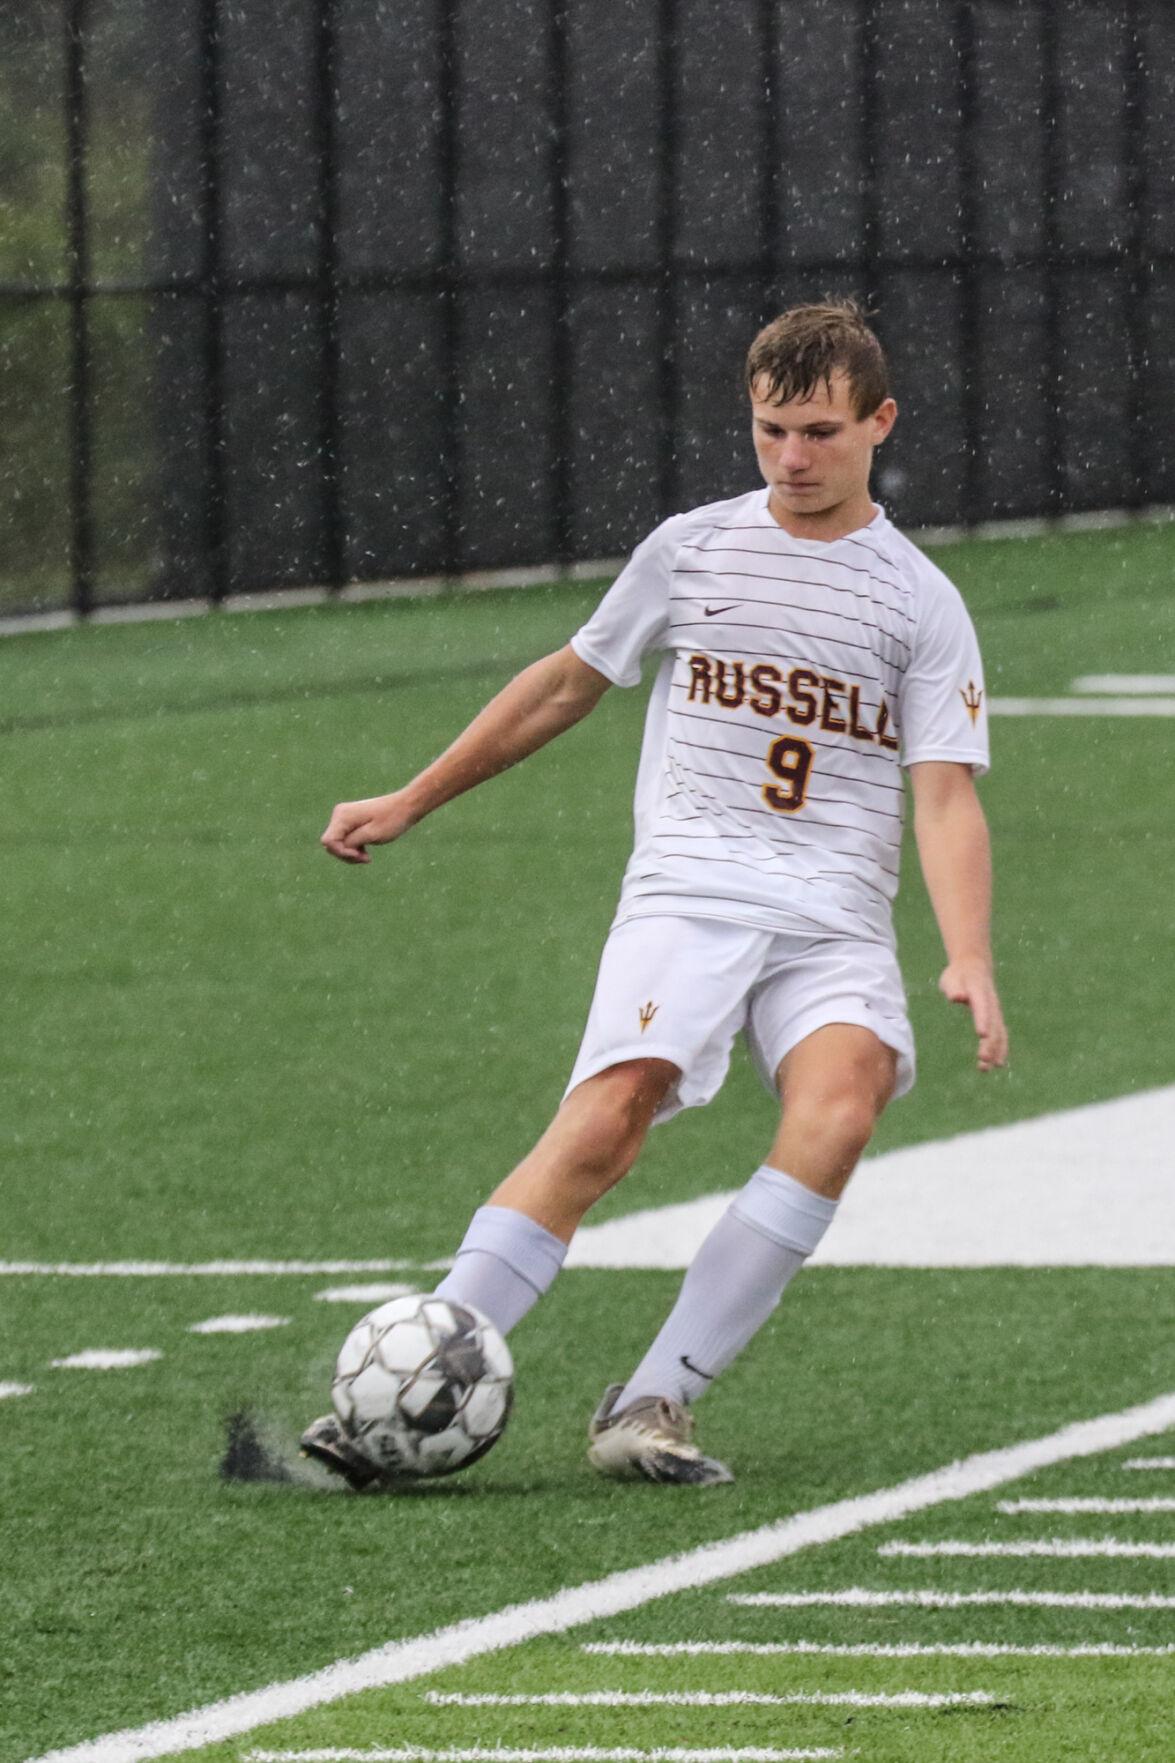 0902 Russell Boyd County Boys Soccer-2.jpg